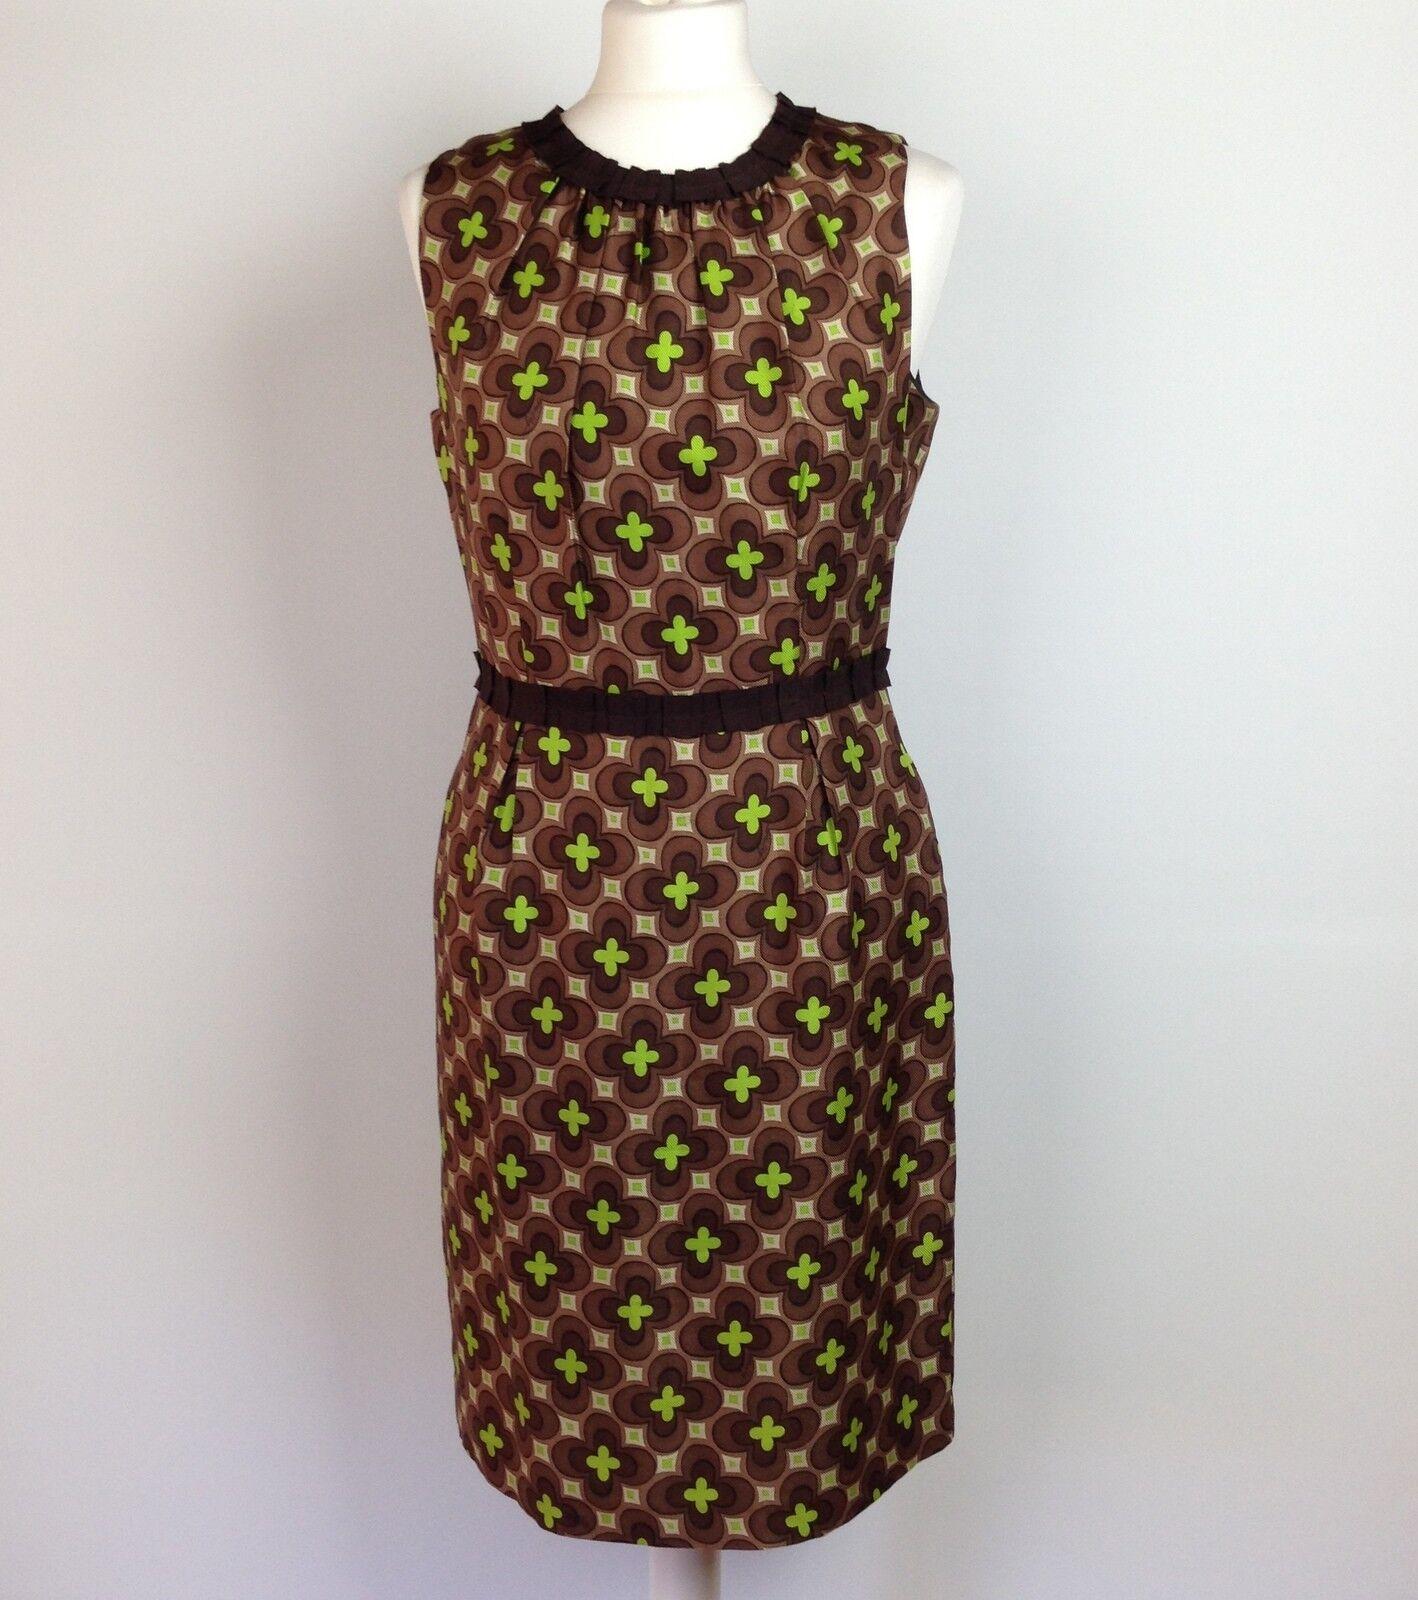 Milly of New York Dress US Größe 6 UK Größe 10 braun Silk Shift damen